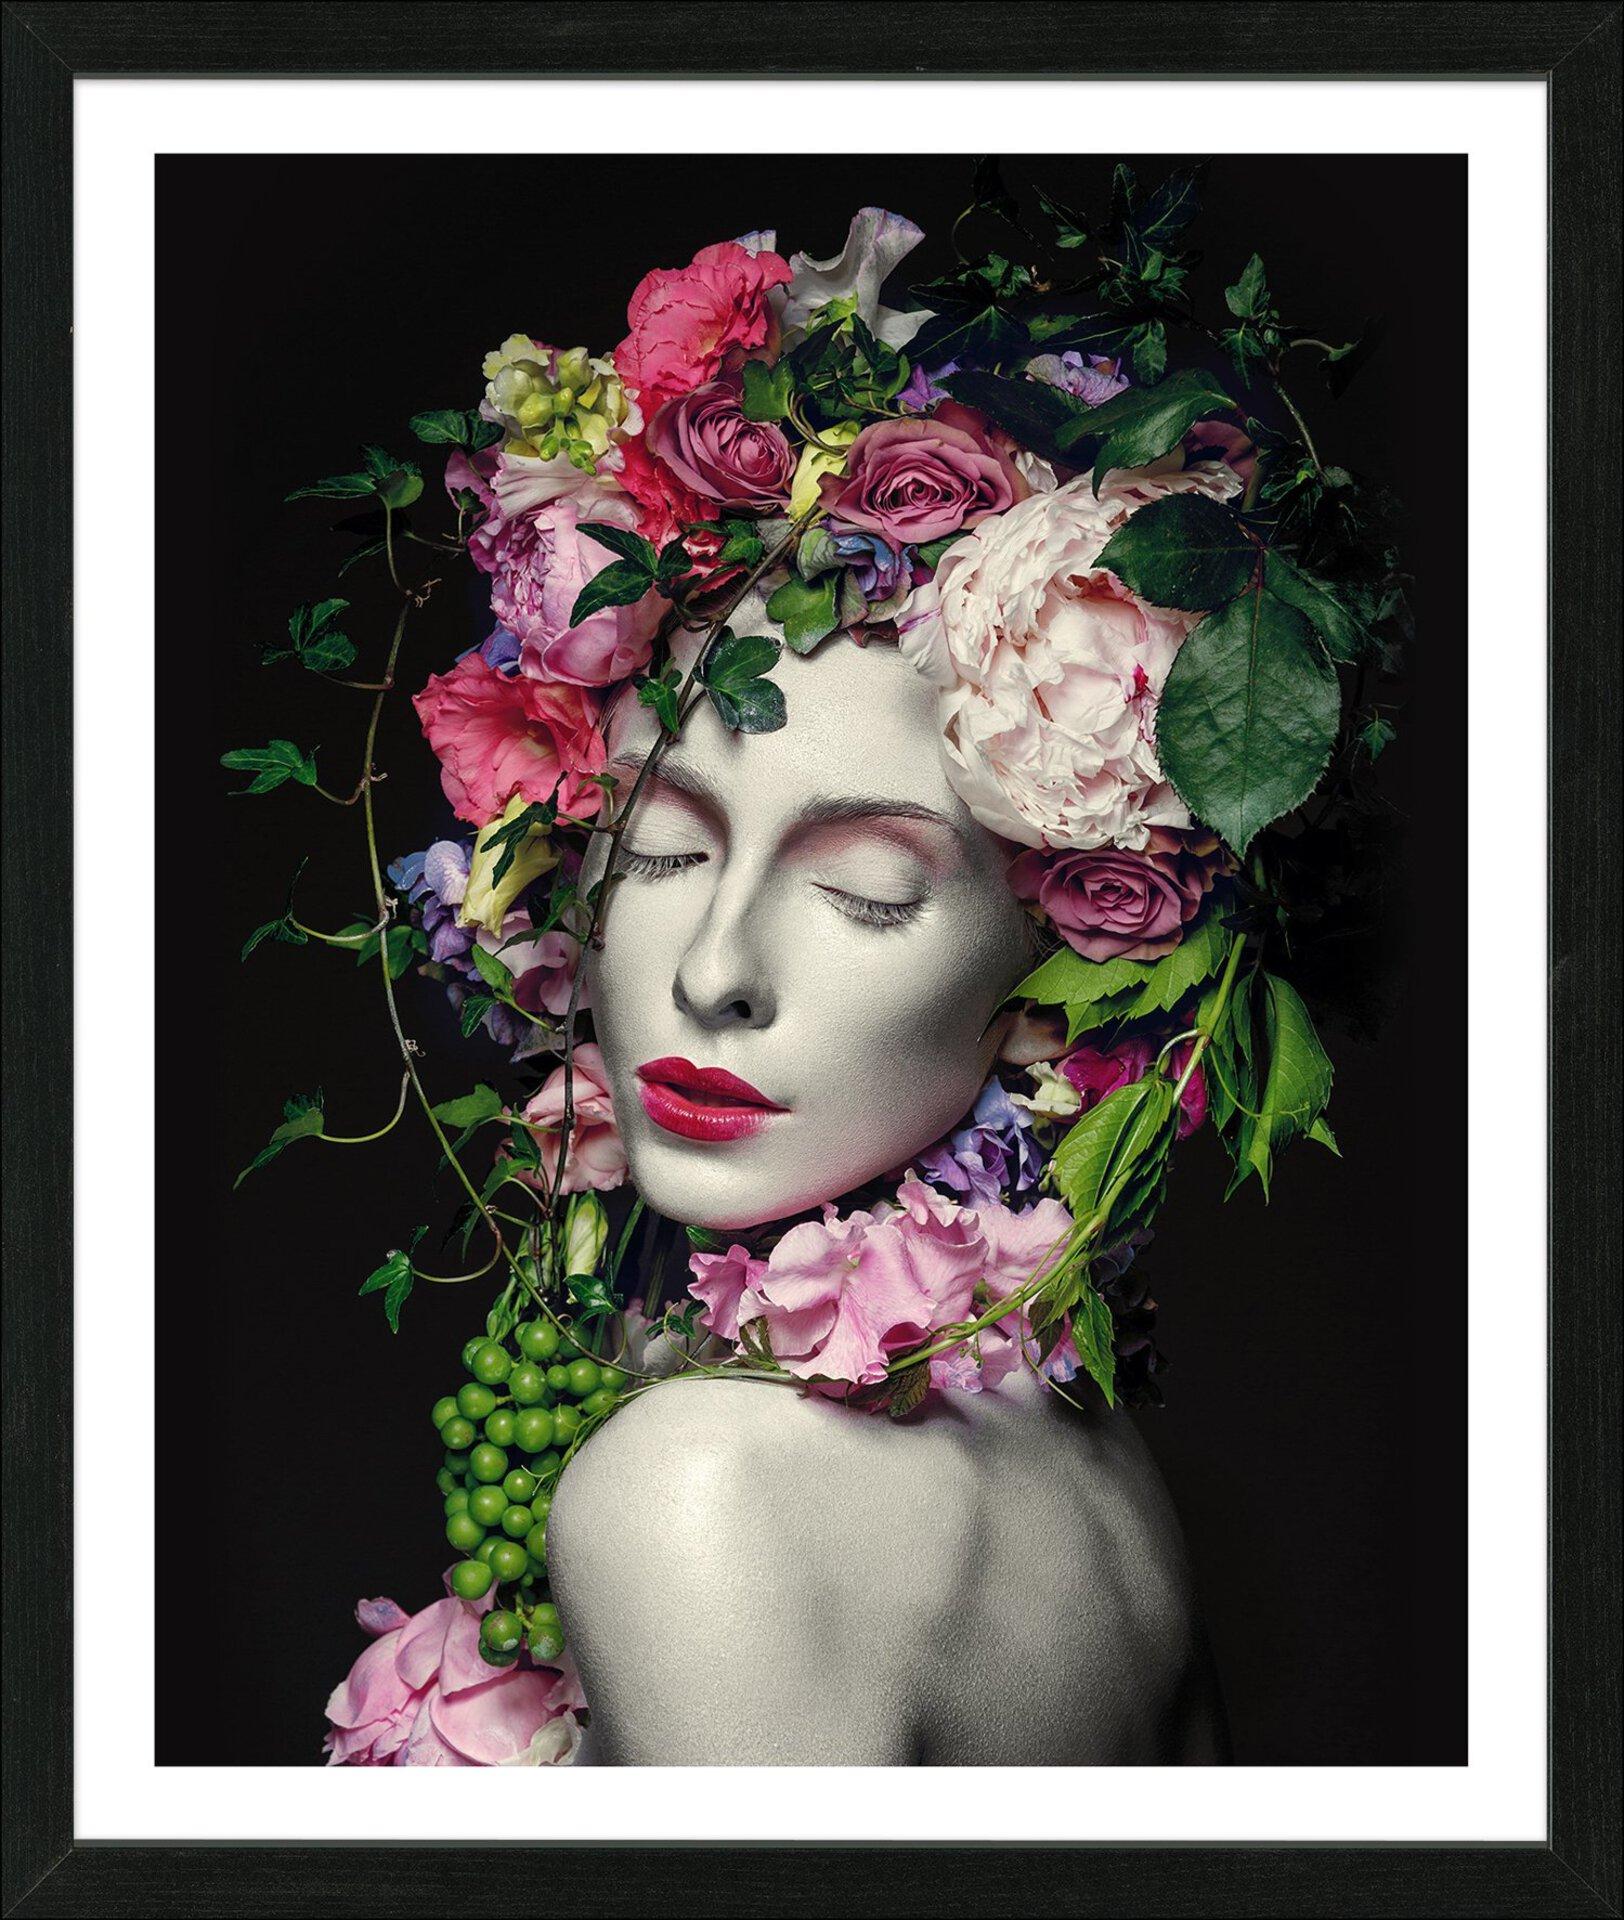 Bild Flowerwoman Pro-Art Holzwerkstoff mehrfarbig 65 x 55 x 3 cm